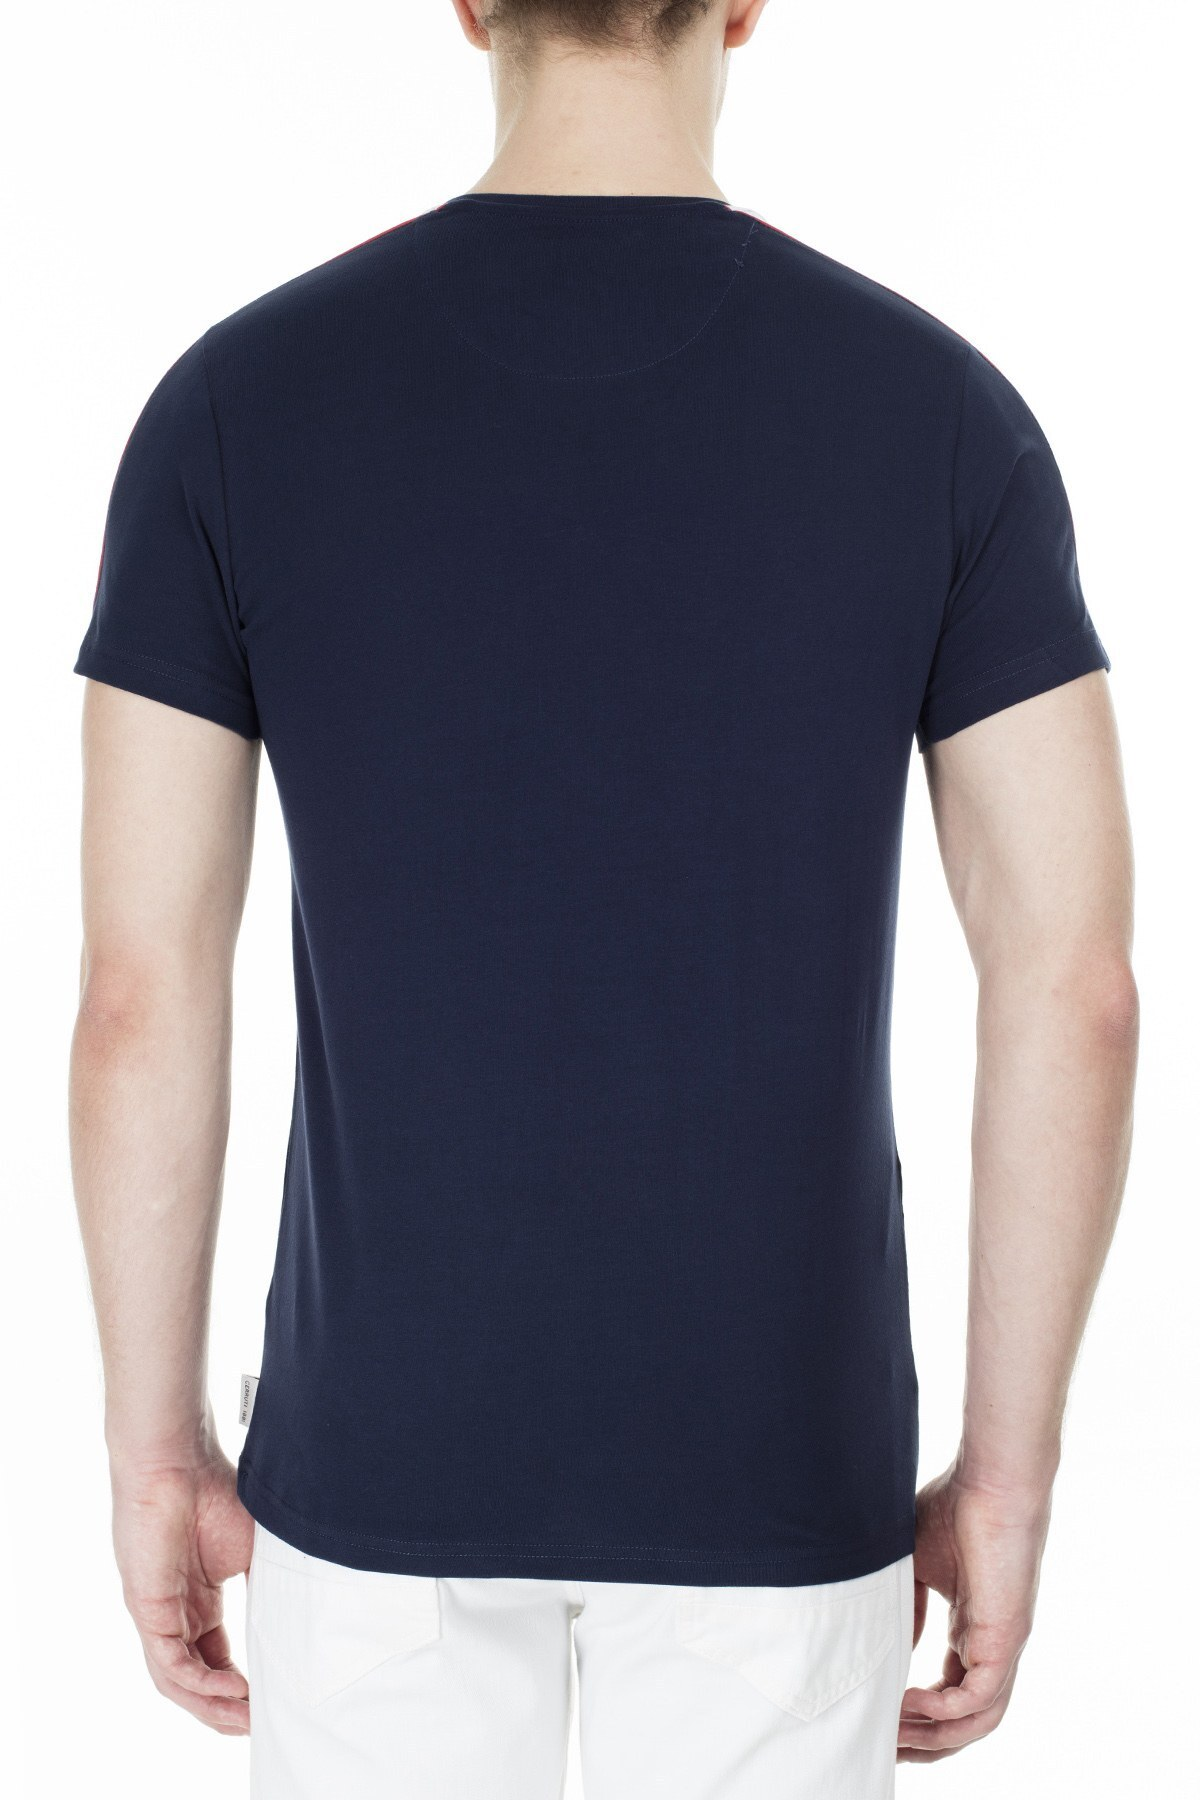 Cerruti 1881 Erkek T Shirt 203-001719 LACİVERT